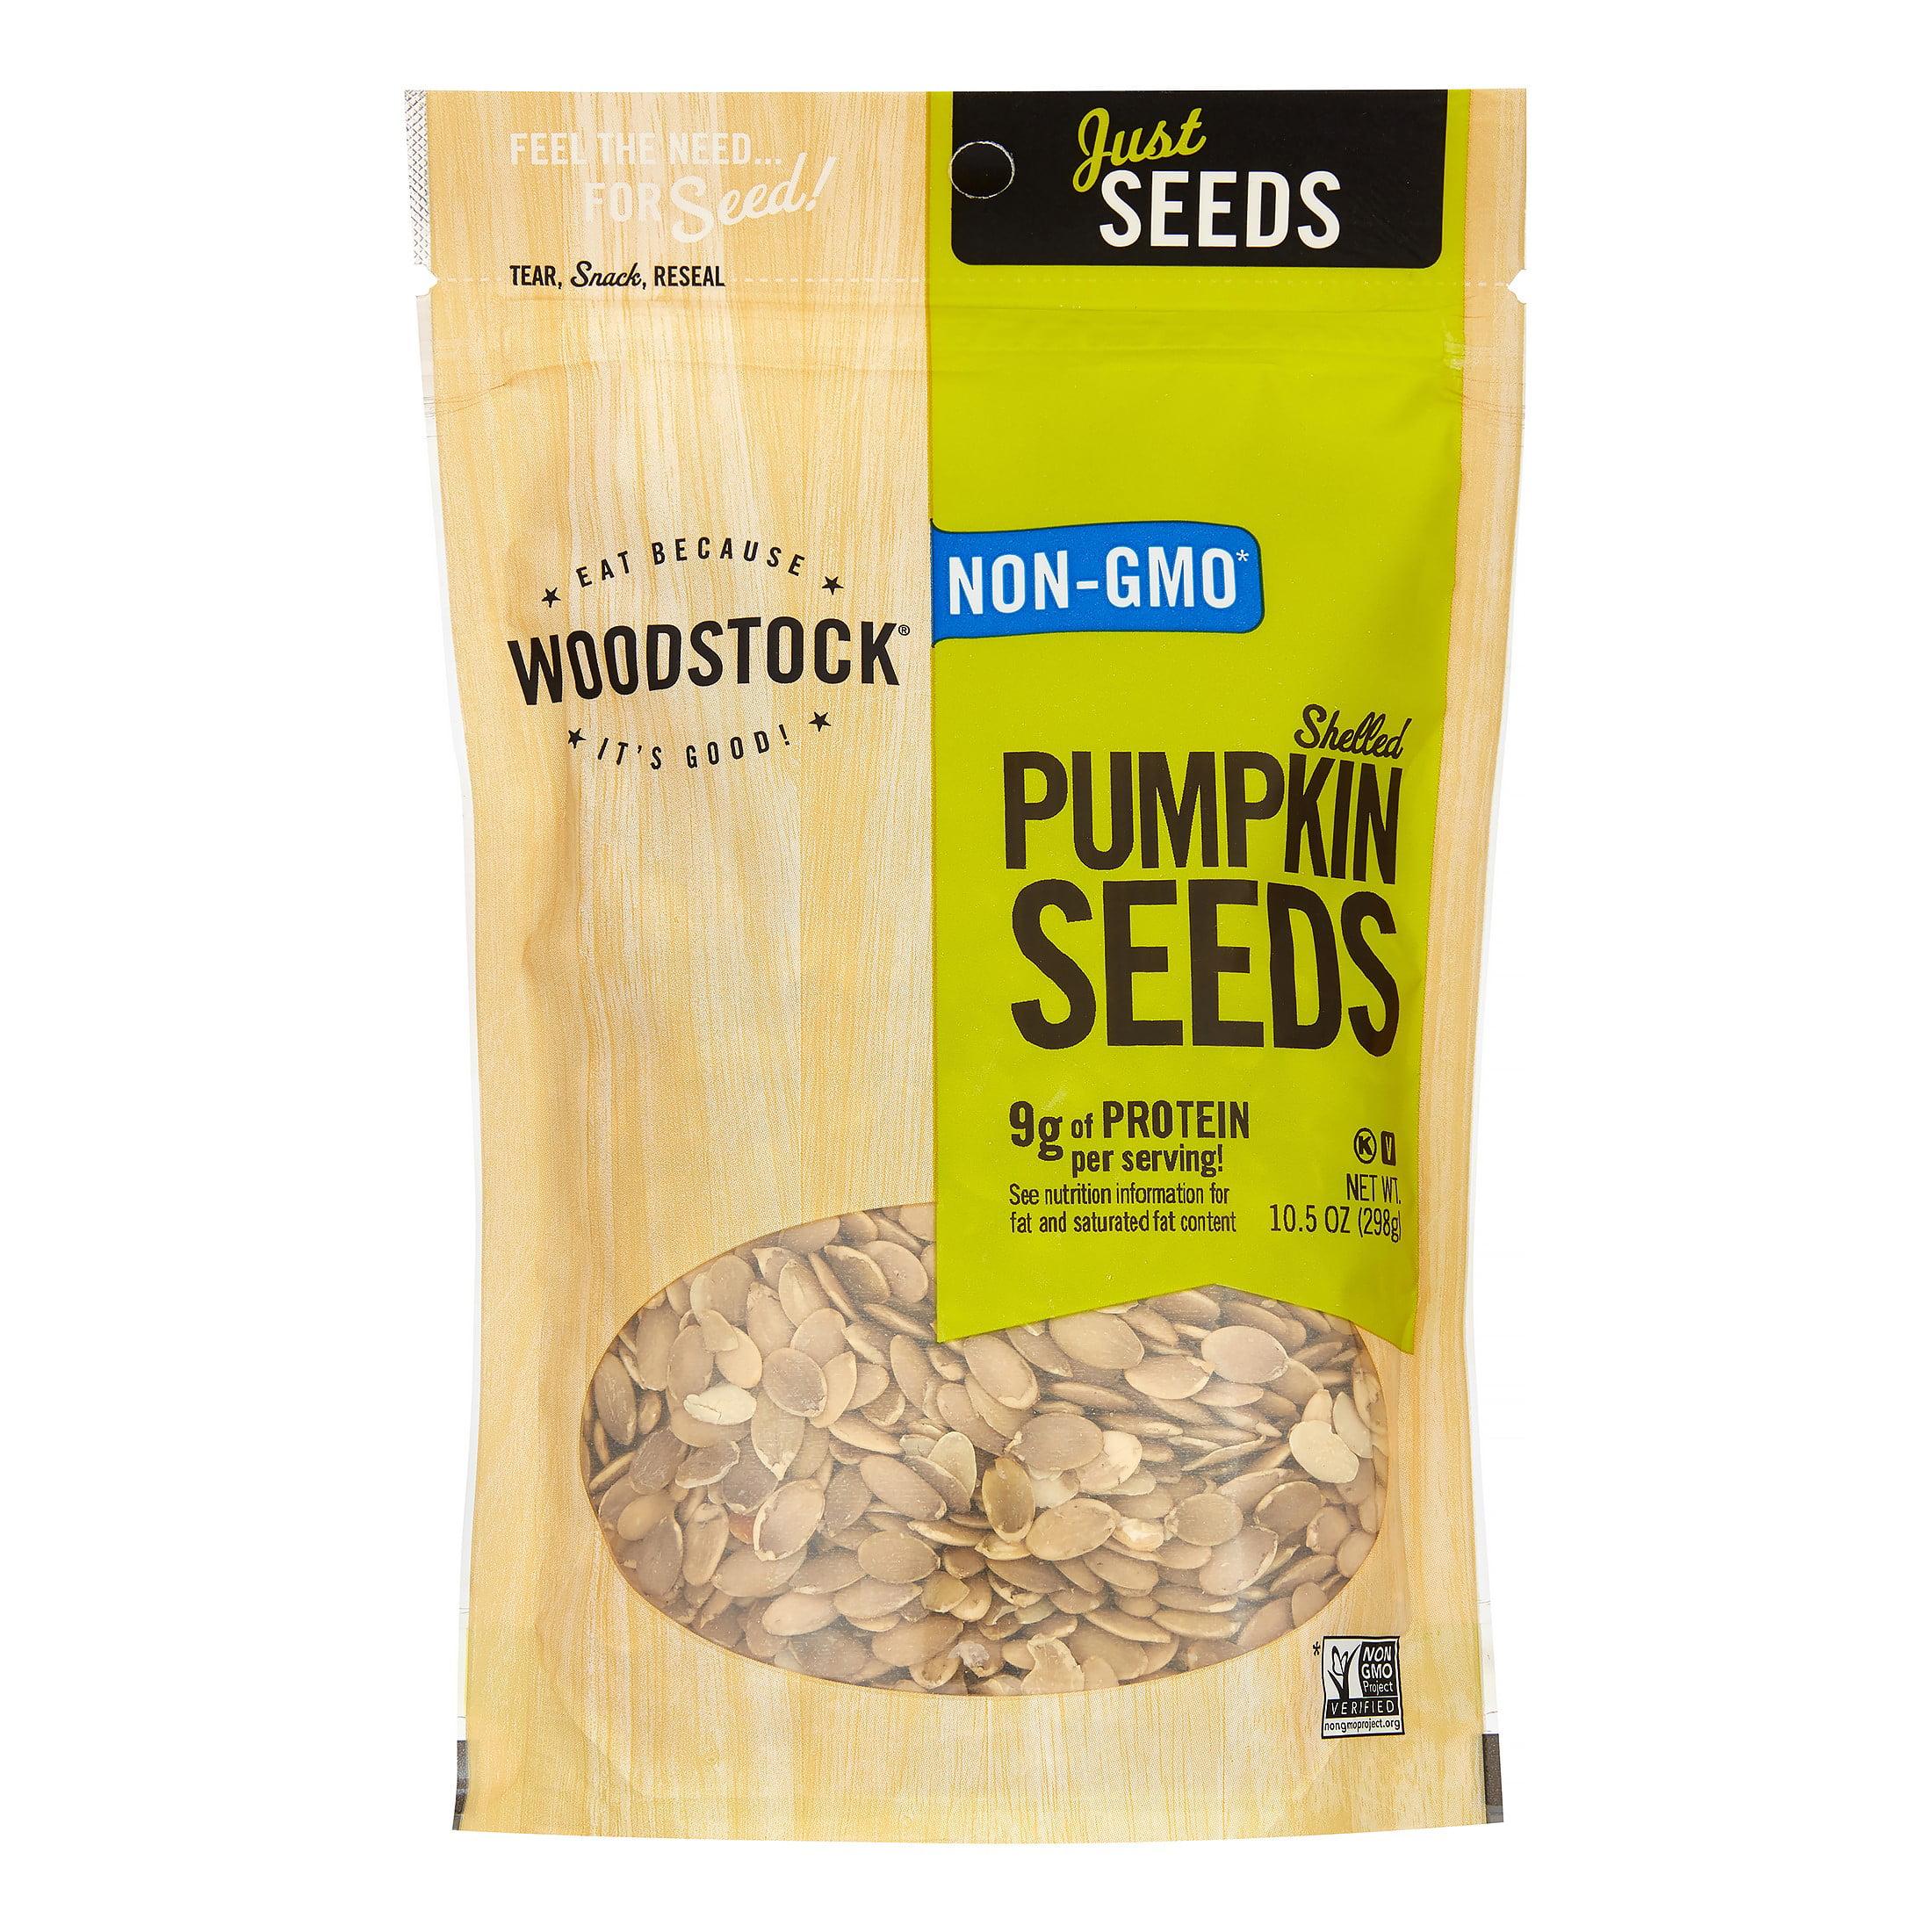 Woodstock Seeds - All Natural - Pumpkin - Pepitas - Shelled - Raw - 10.5 Oz